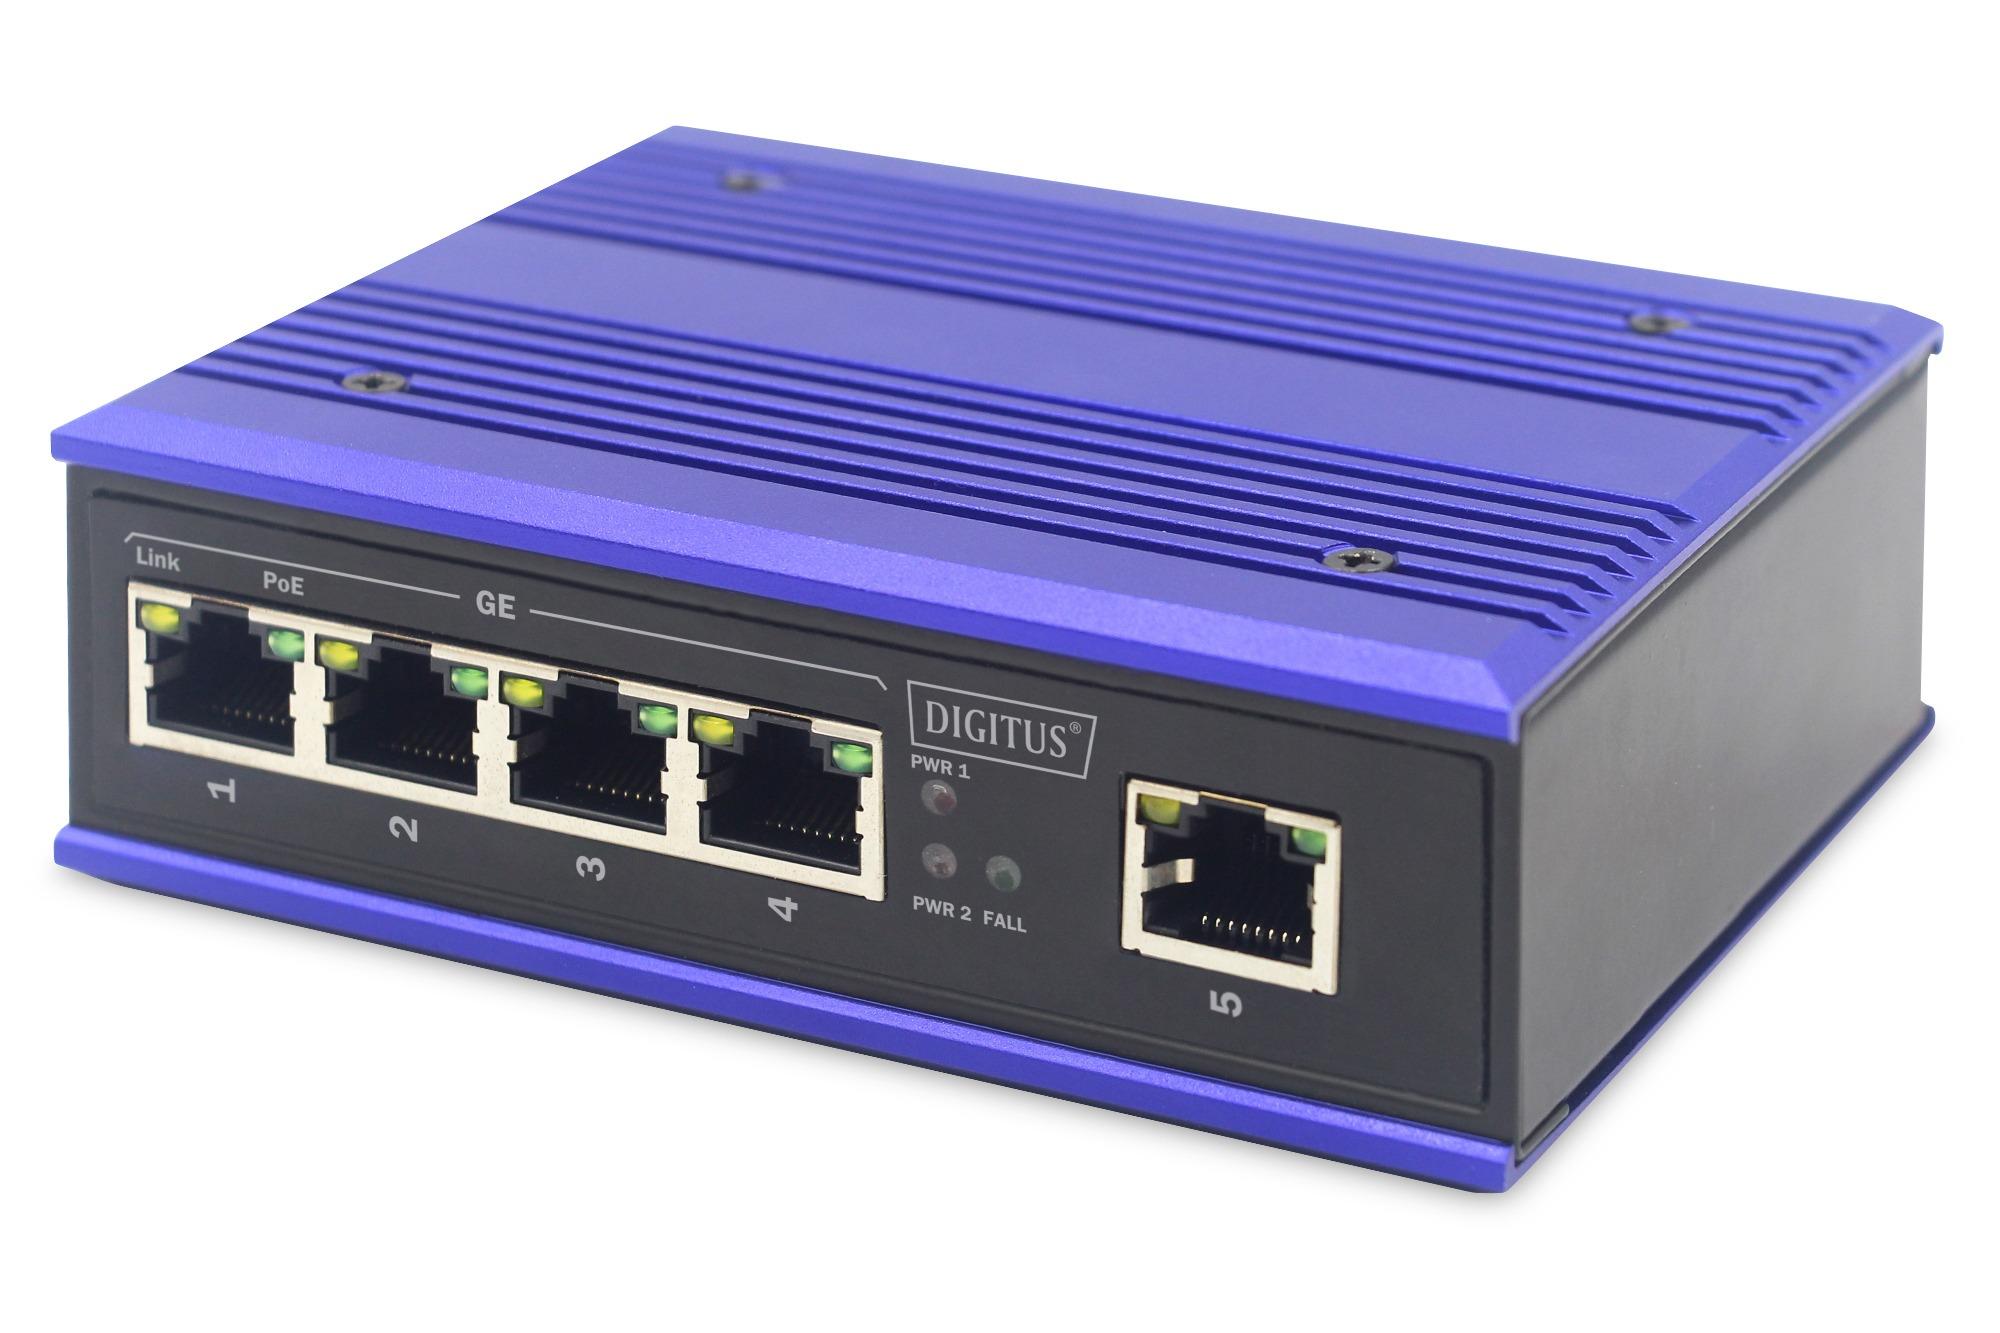 Switch industriale 4 porte gigabit poe + 1 porta uplink din rail